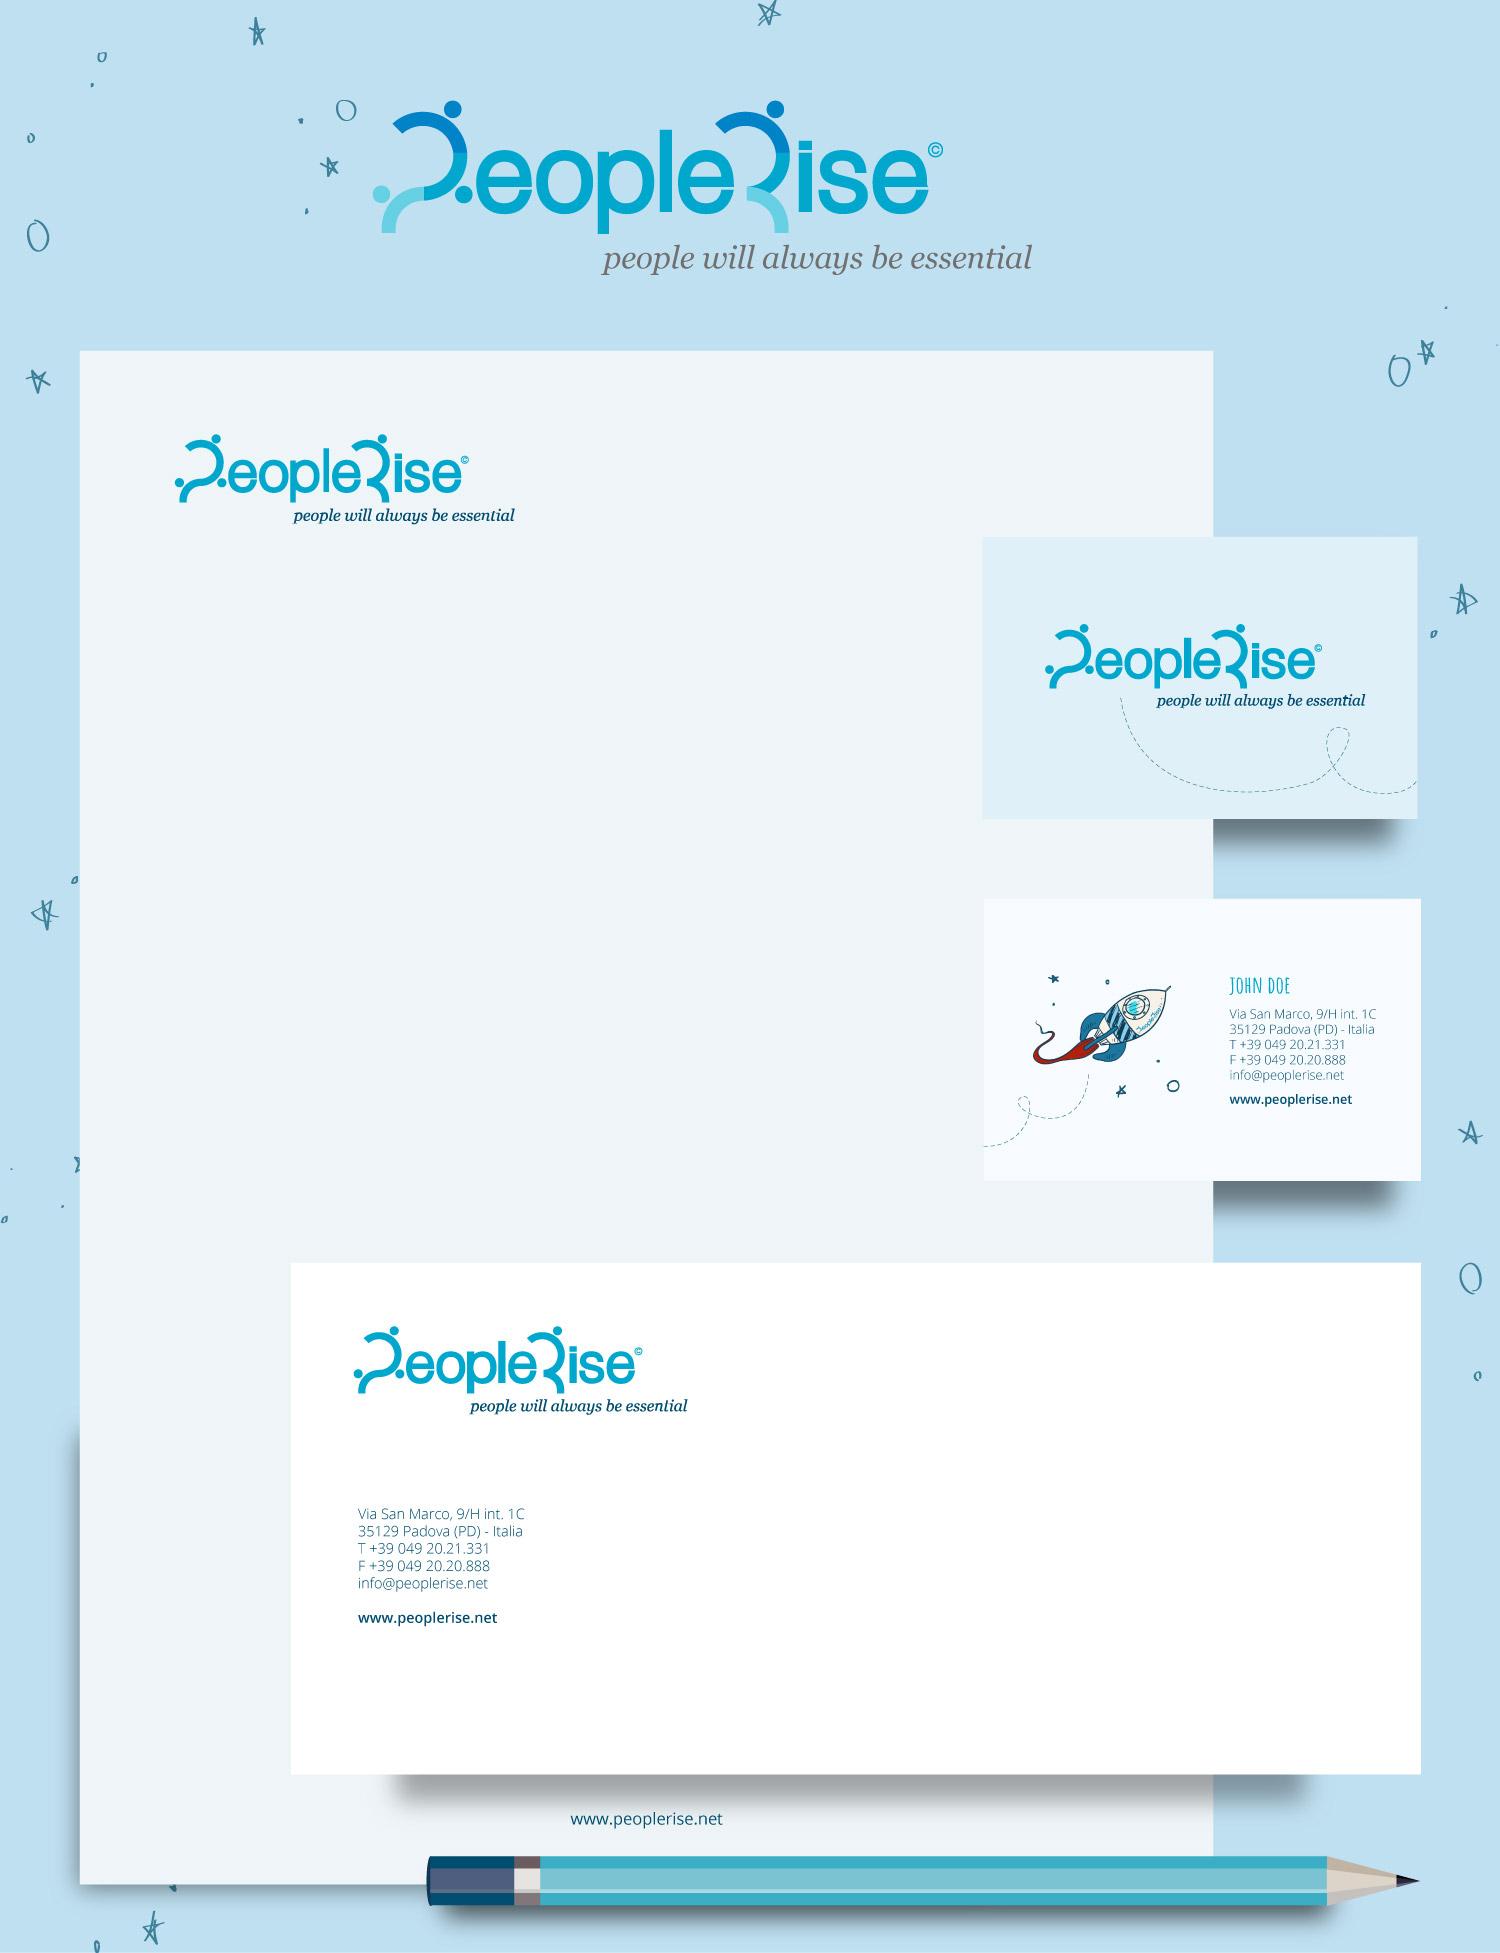 Creazione logo per azienda di consulenza